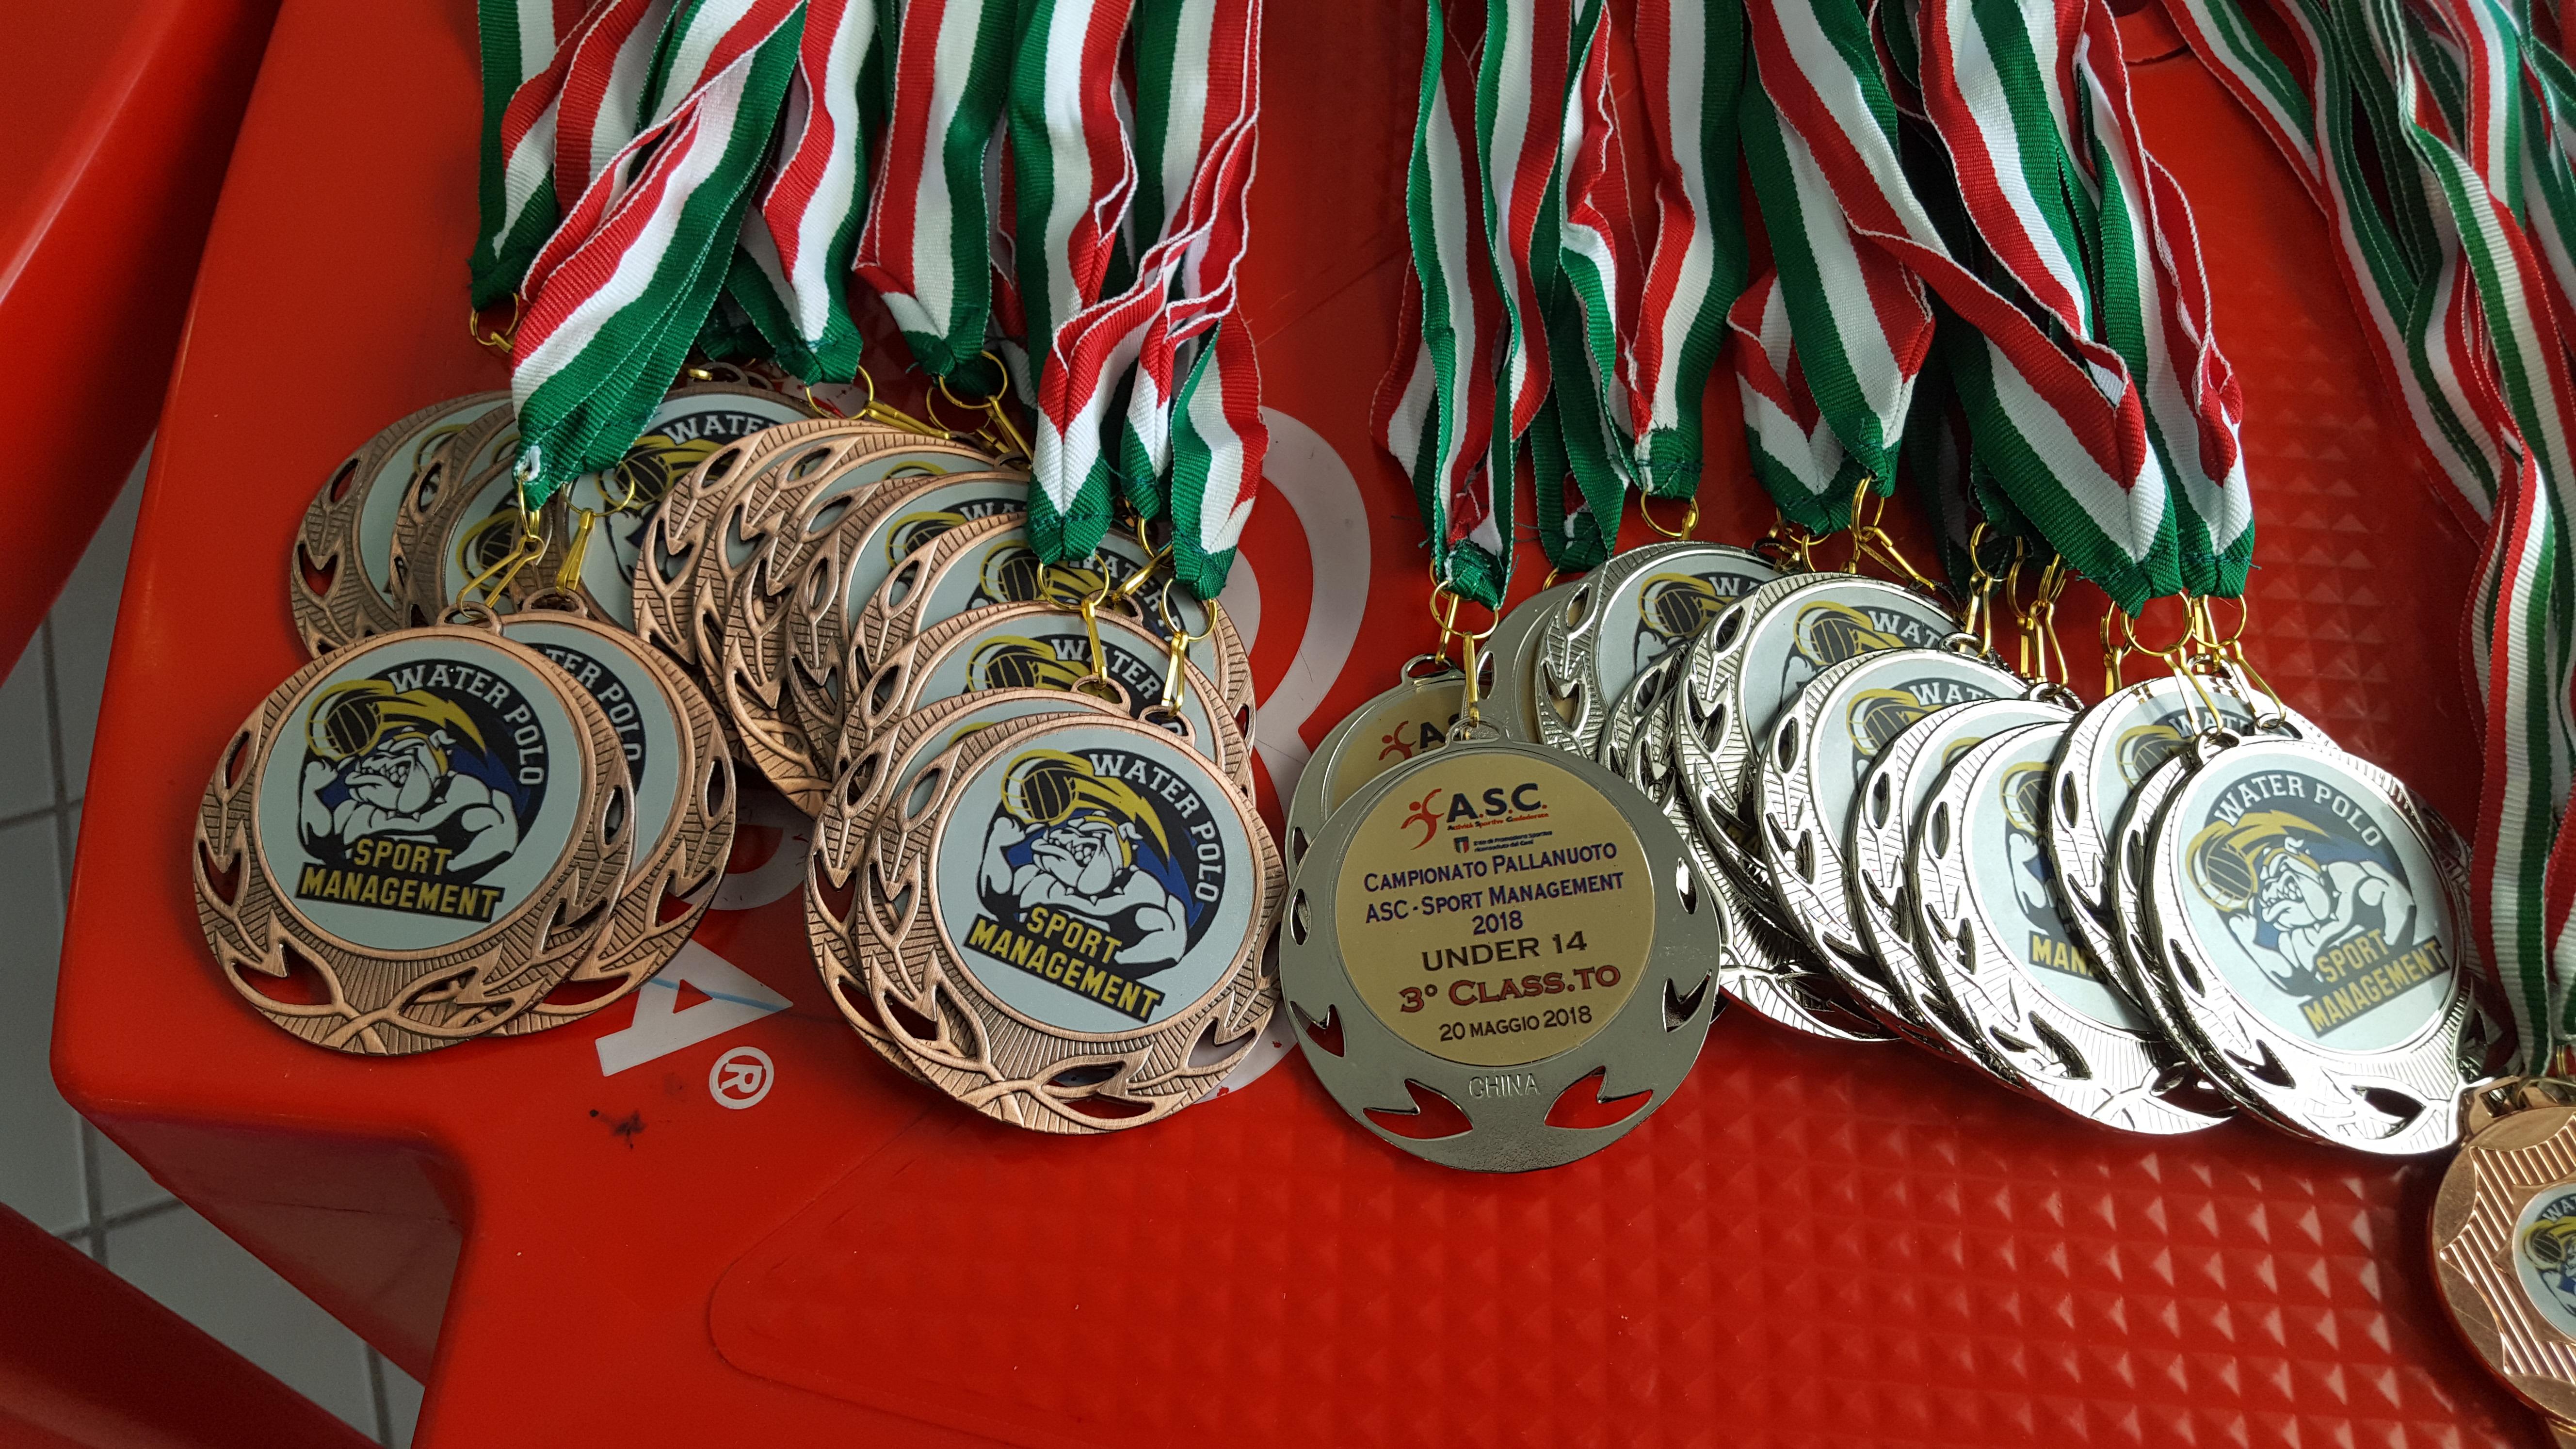 1   Trofeo internazionale di nuoto ASC - SPORTMANAGEMENT Atleti Lombardi